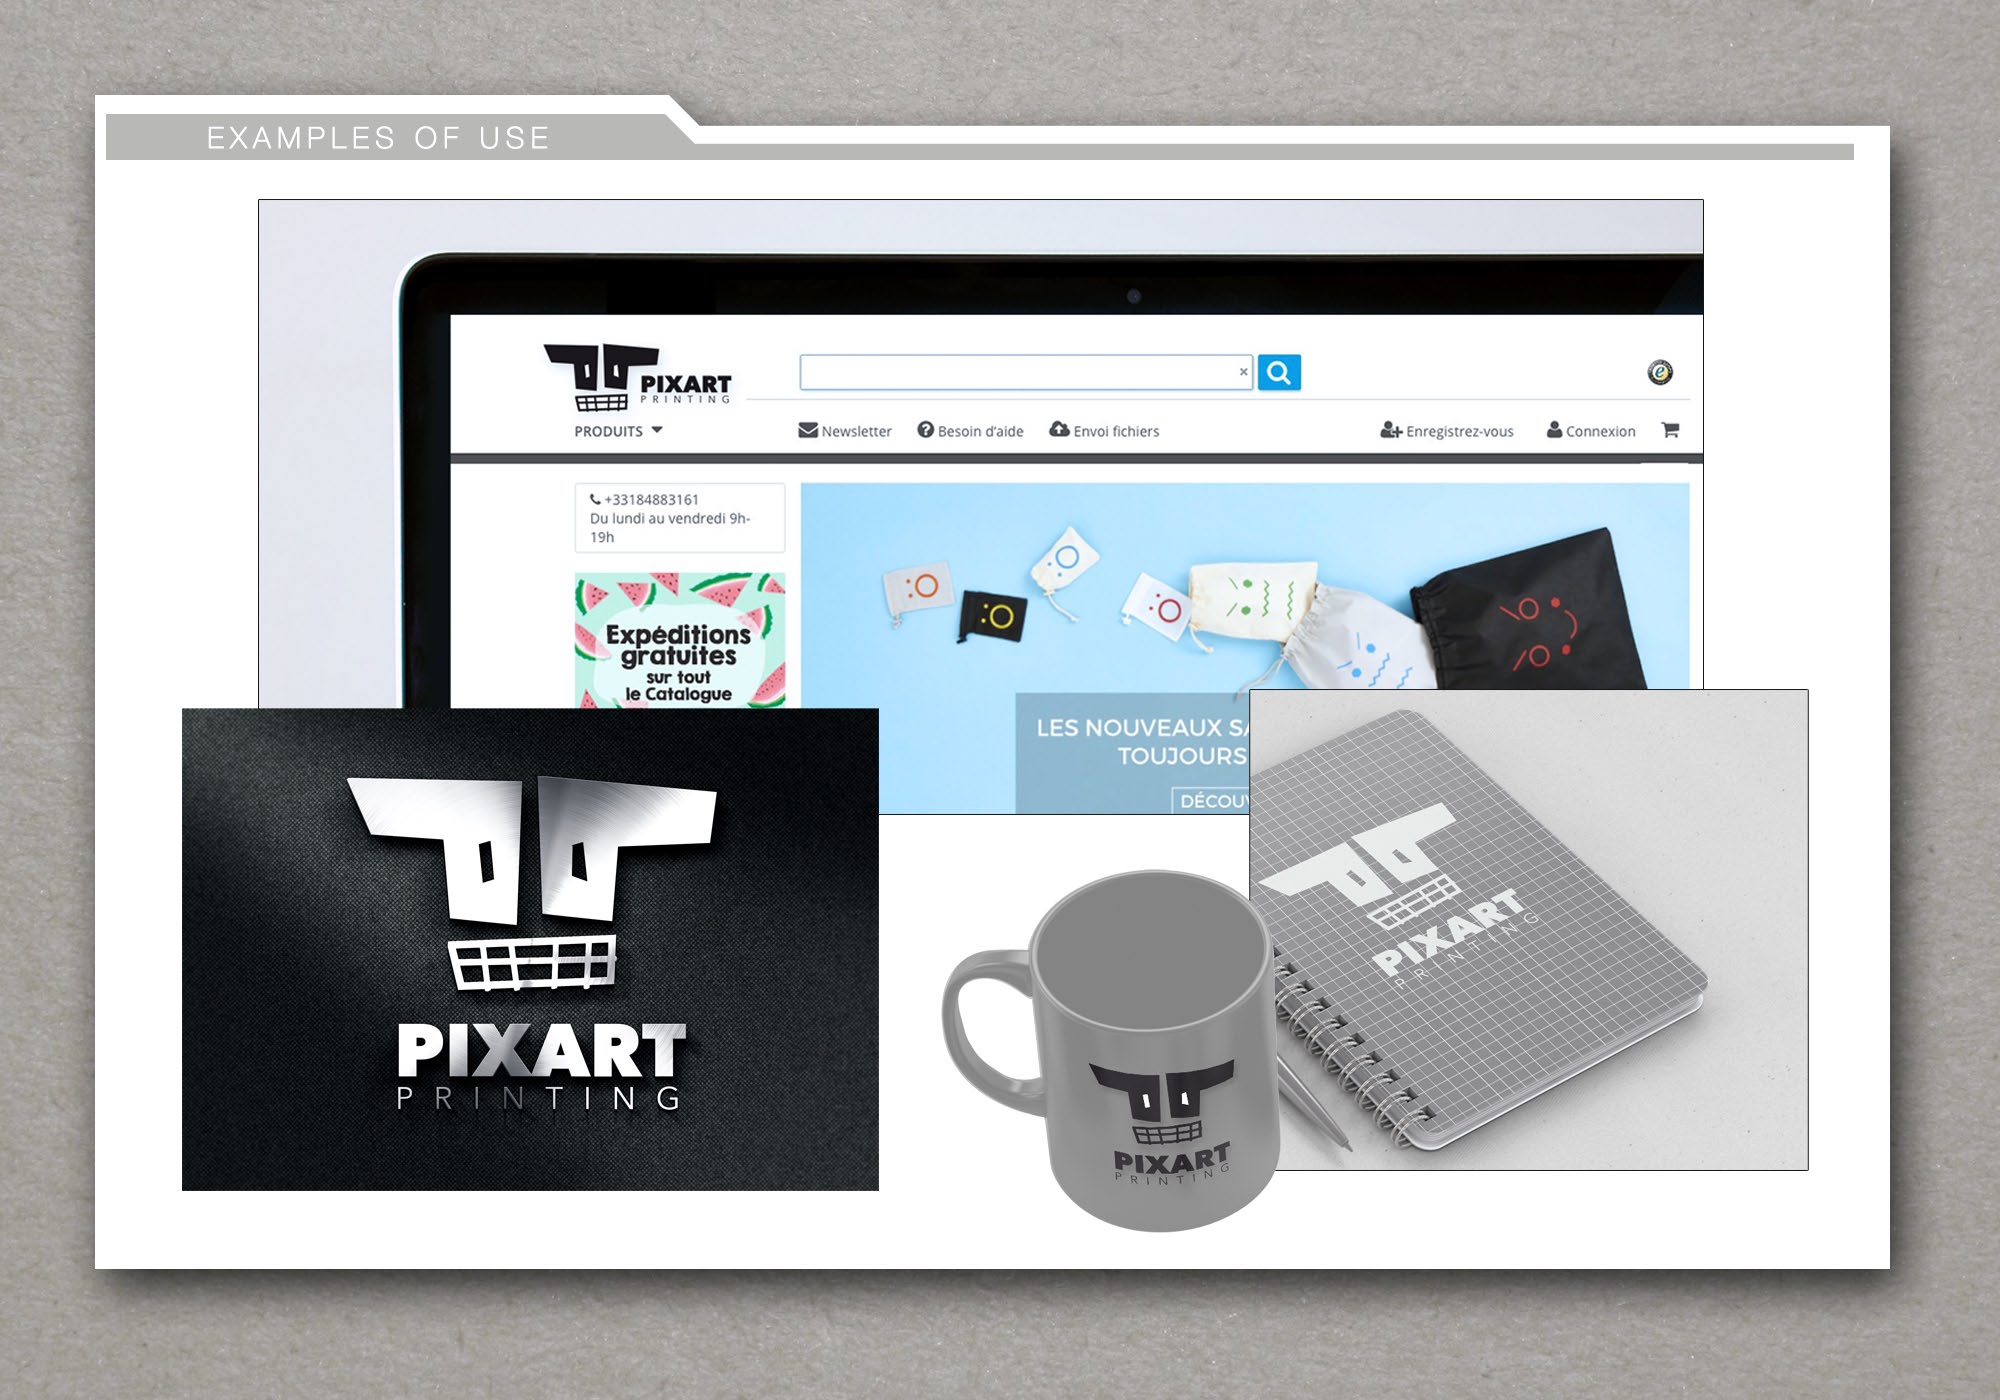 PIXARTprinting logo contest_Page_7.jpg